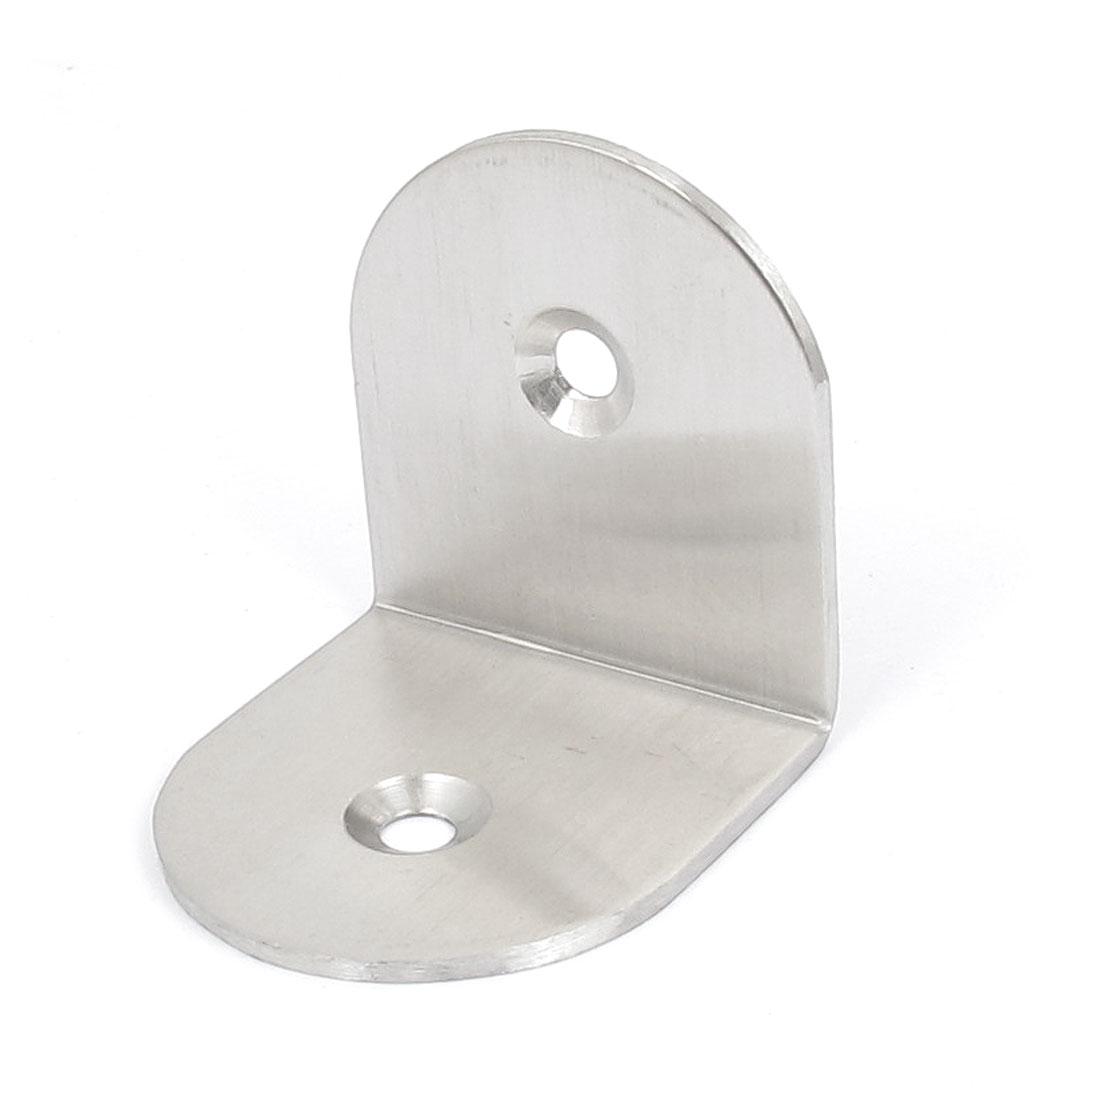 Furniture Shelf Table 40x40x38mm 2 Holes L Shaped Angle Brackets Corner Braces Supports